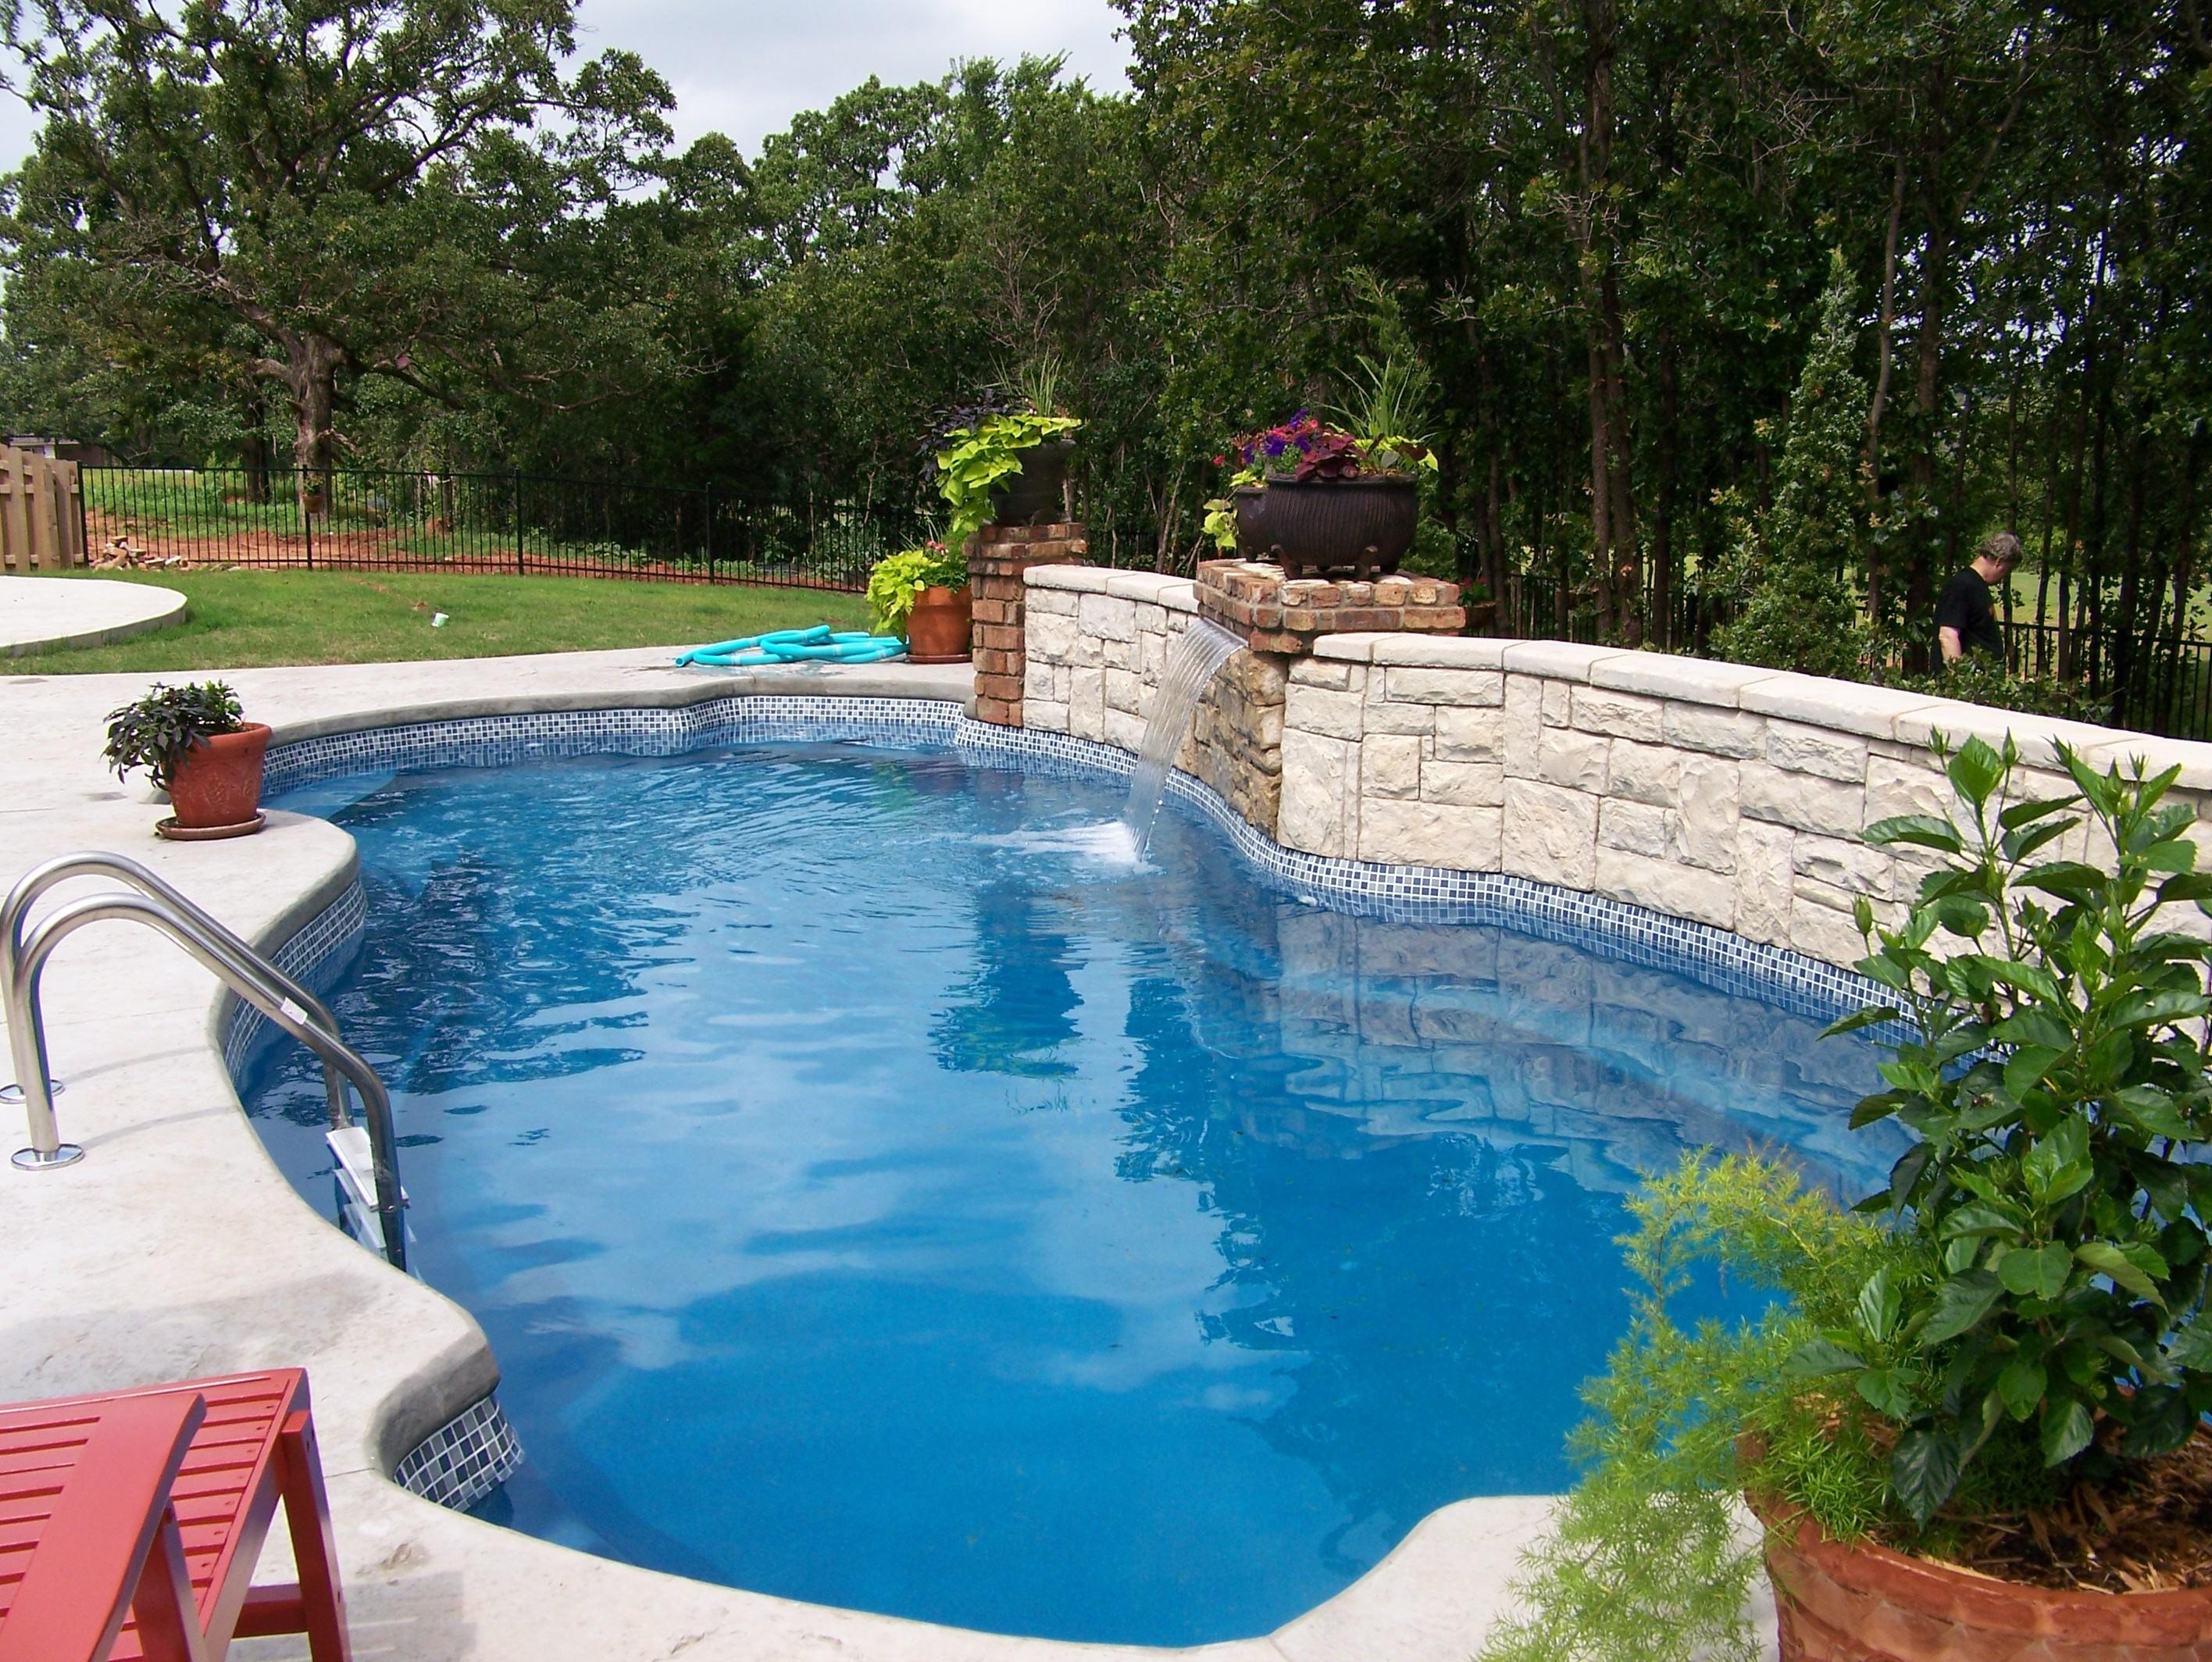 Fiberglass pool with water bar.